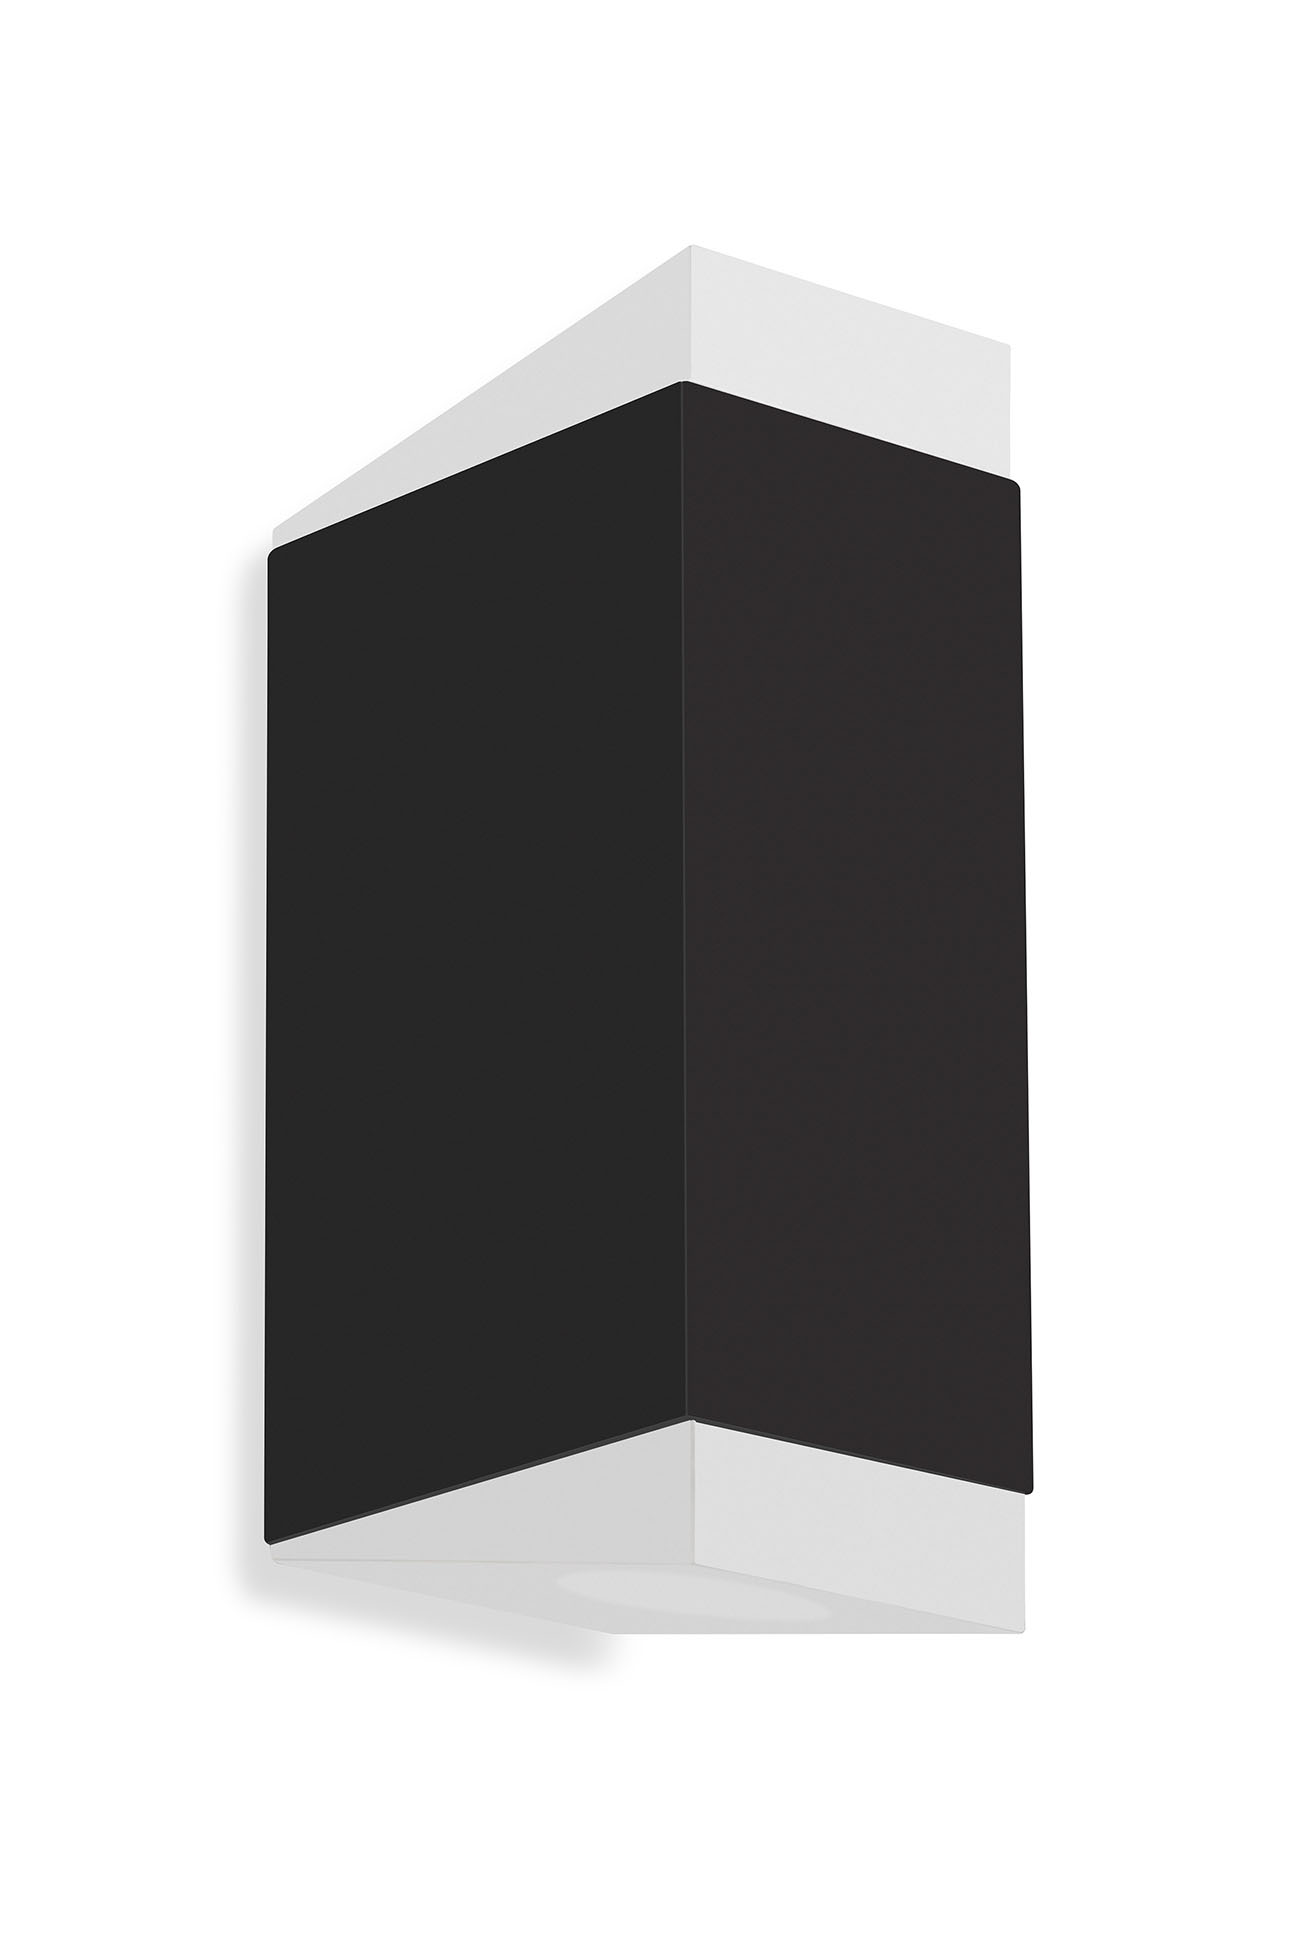 TELEFUNKEN LED Aussenwandleuchte, 19 cm, 10 W, Schwarz